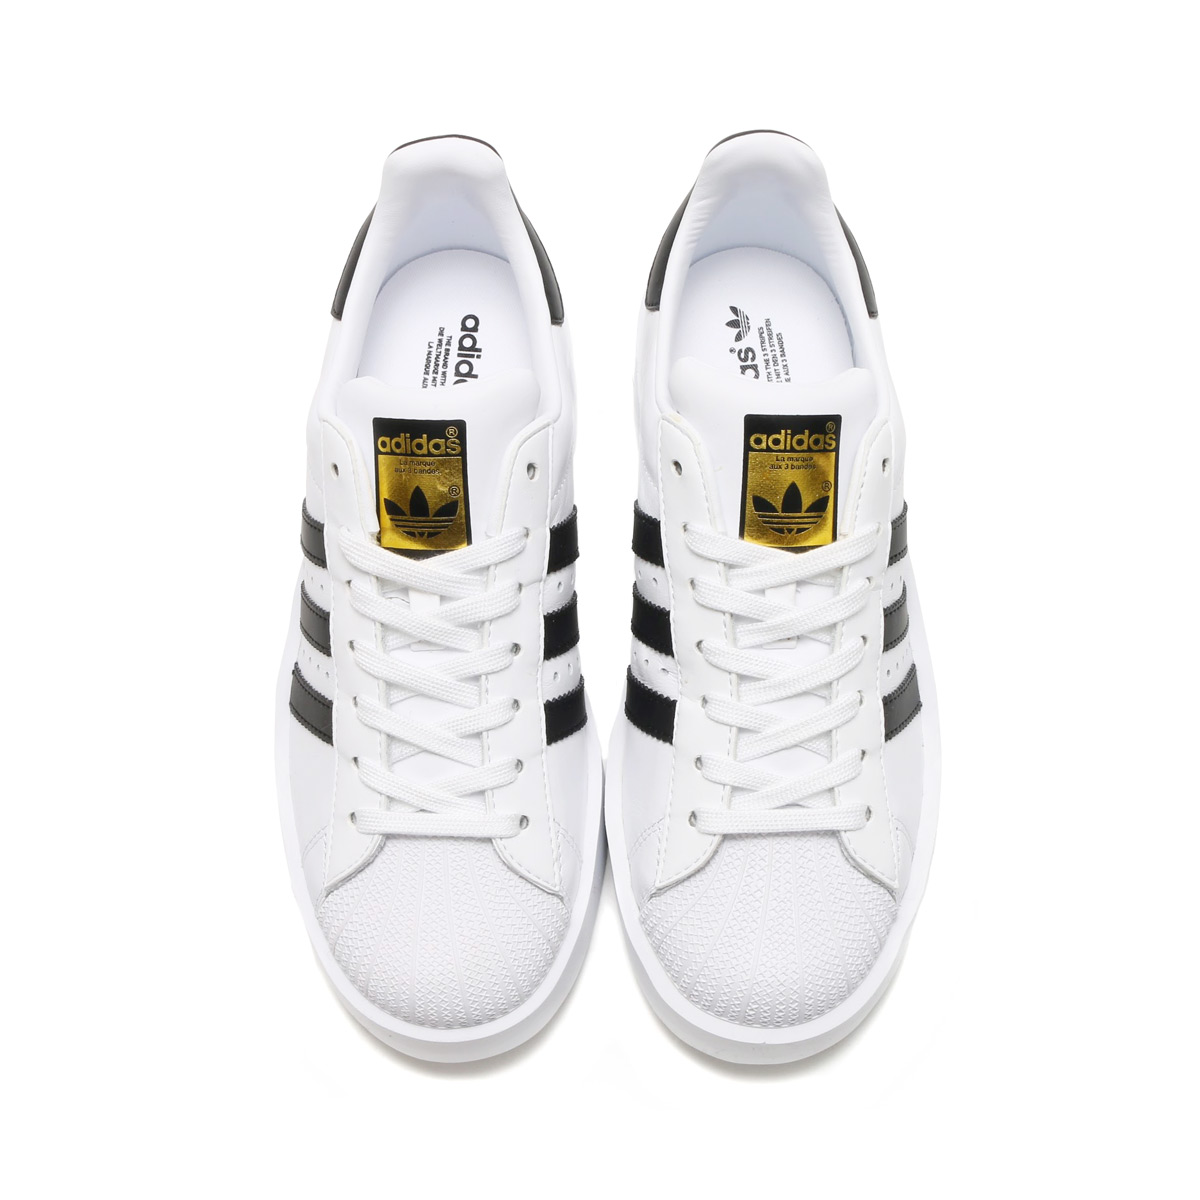 adidas Originals SUPERSTAR BD W (Adidas originals superstar boldface) (Running WhiteCore BlackGold Mett)